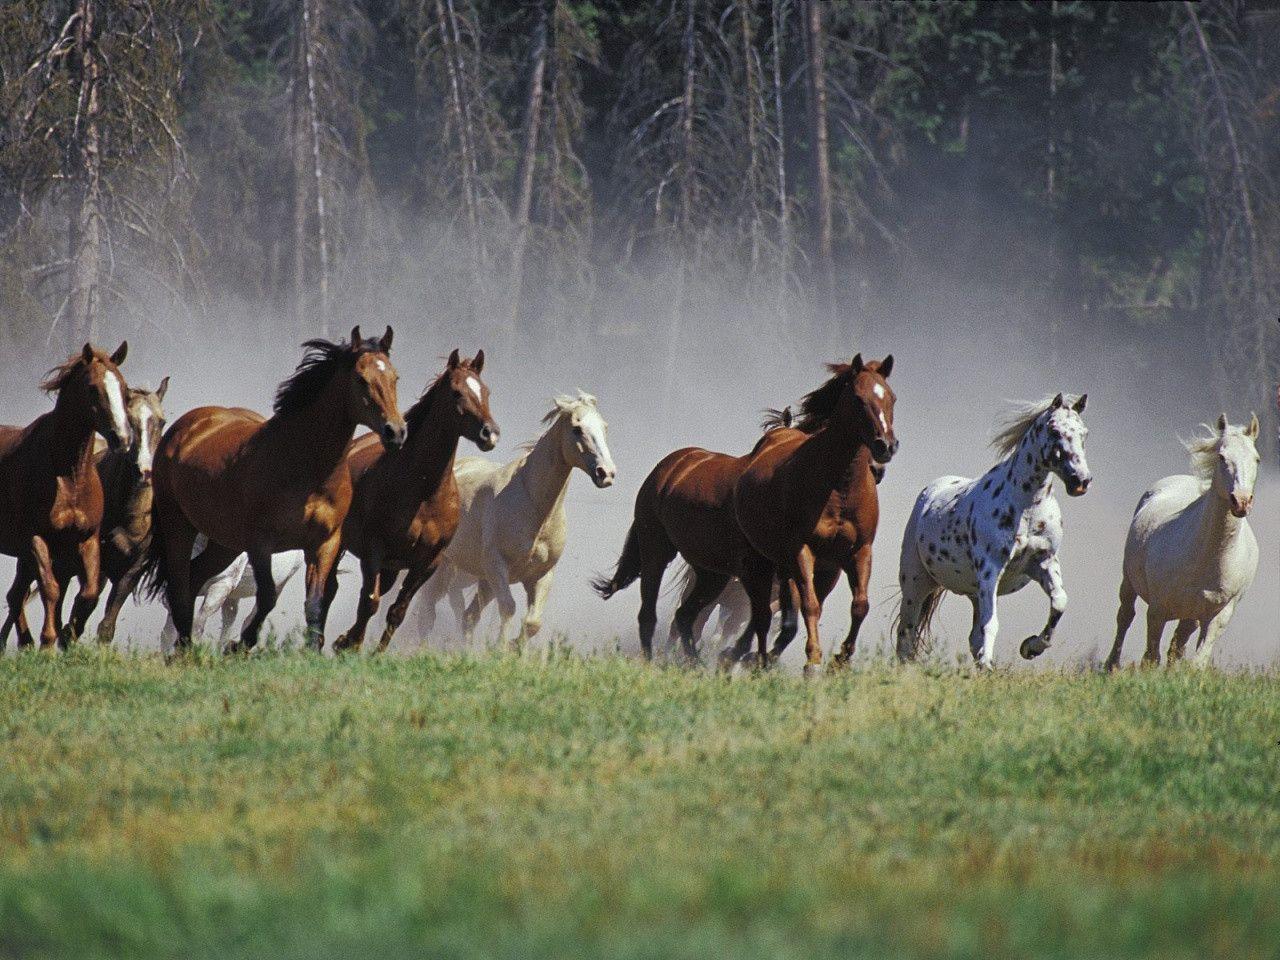 Animal Horse Image HD Wallpaper #931 Wallpaper computer | best ...